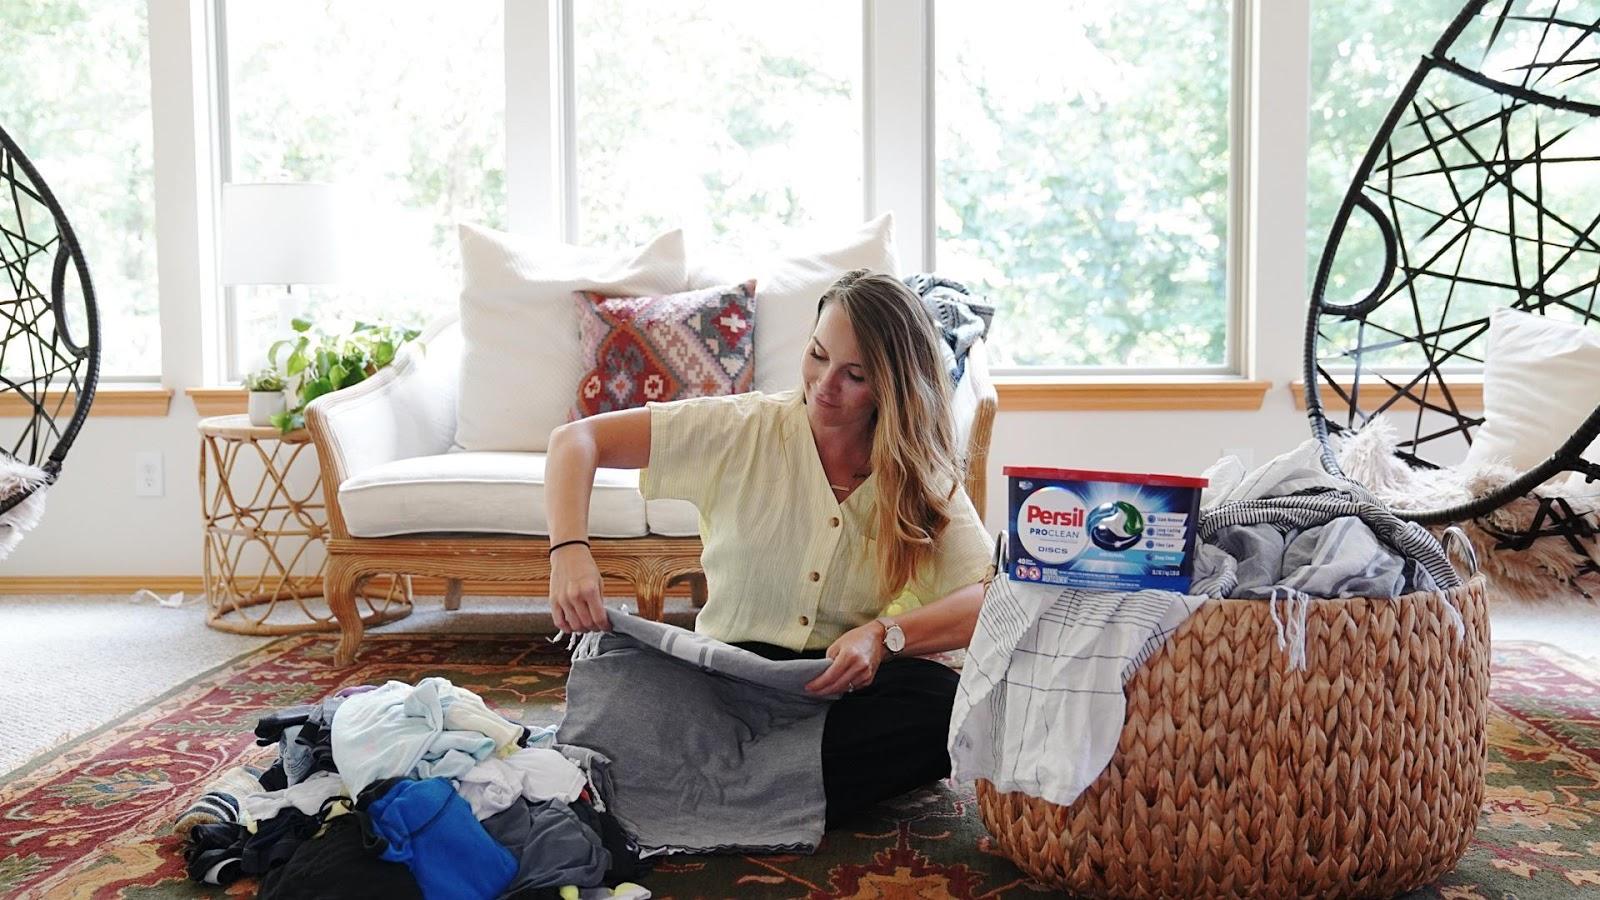 Persil Laundry Detergent.jpg